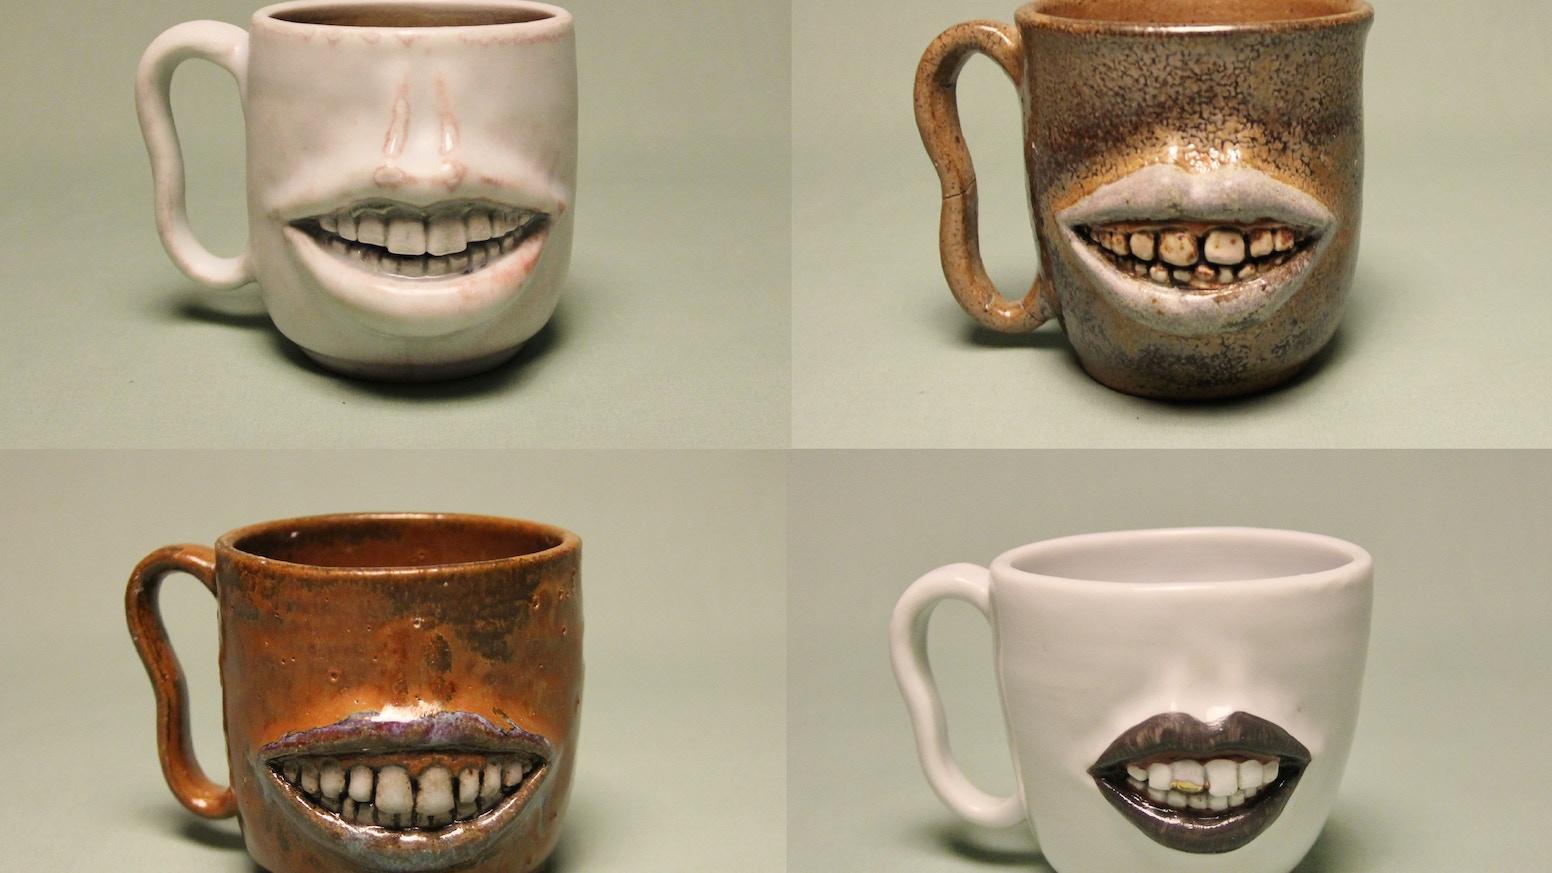 bf2d5fe76df Carli - Ceramics - China by Carli Giese — Kickstarter